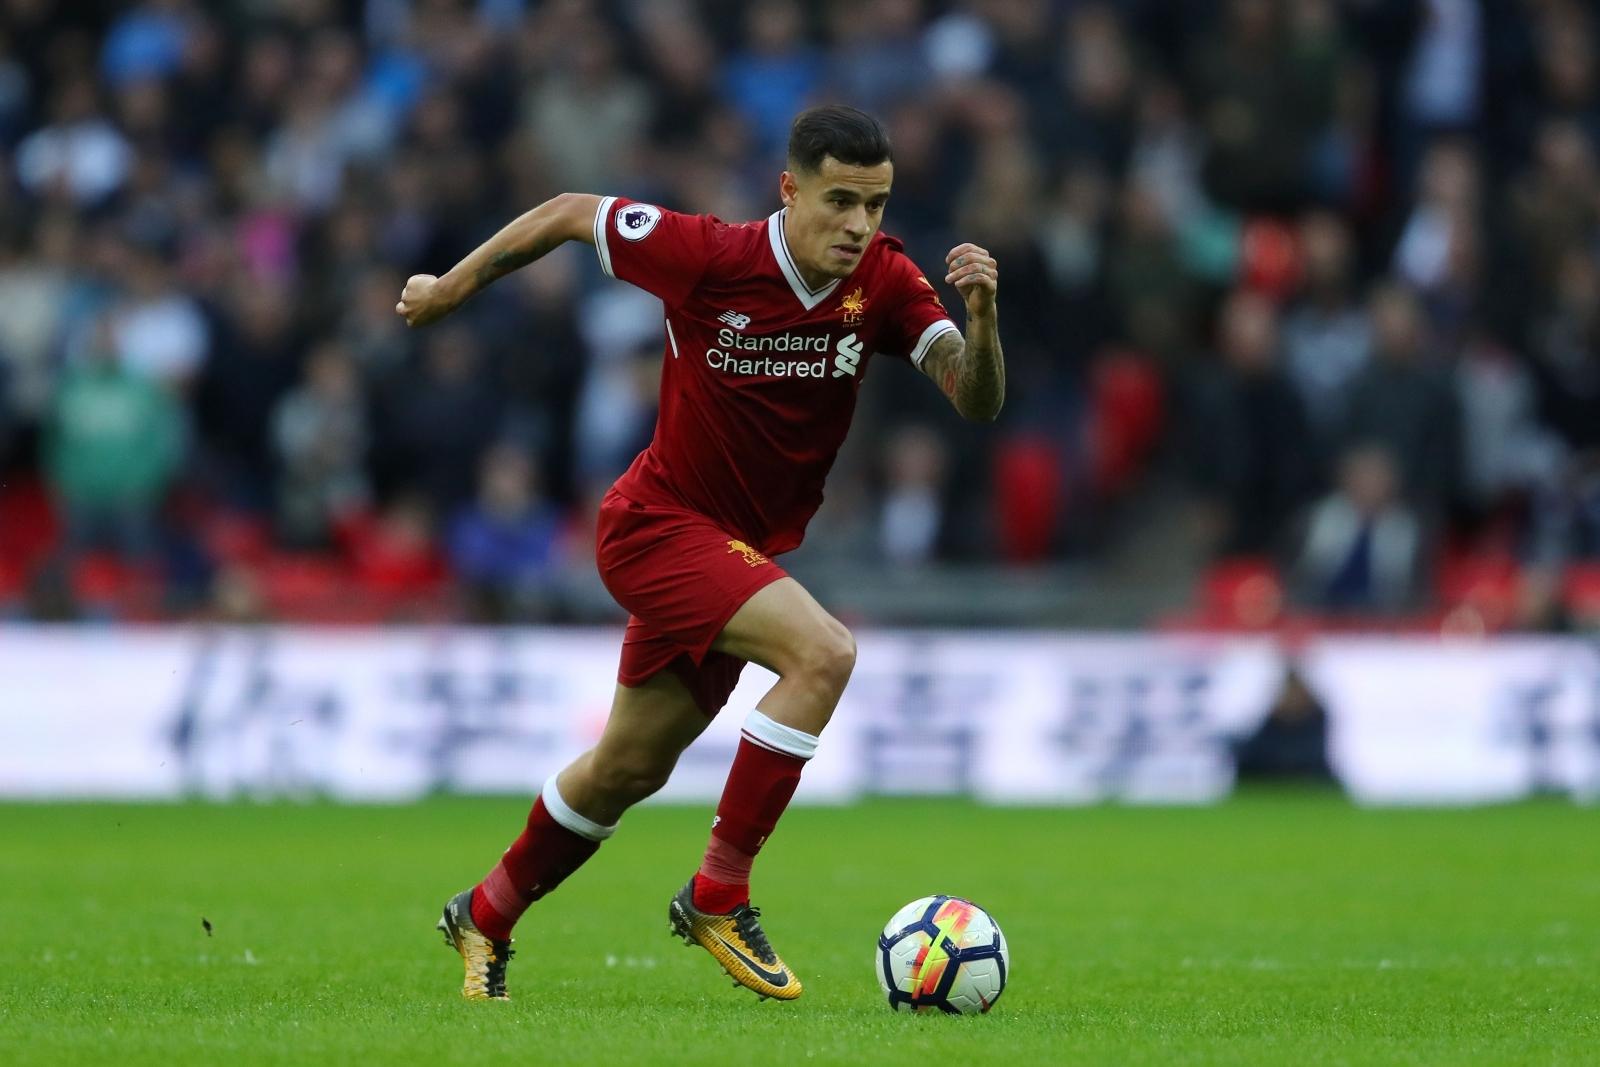 Liverpool boss Jurgen Klopp to make late decision on Philippe